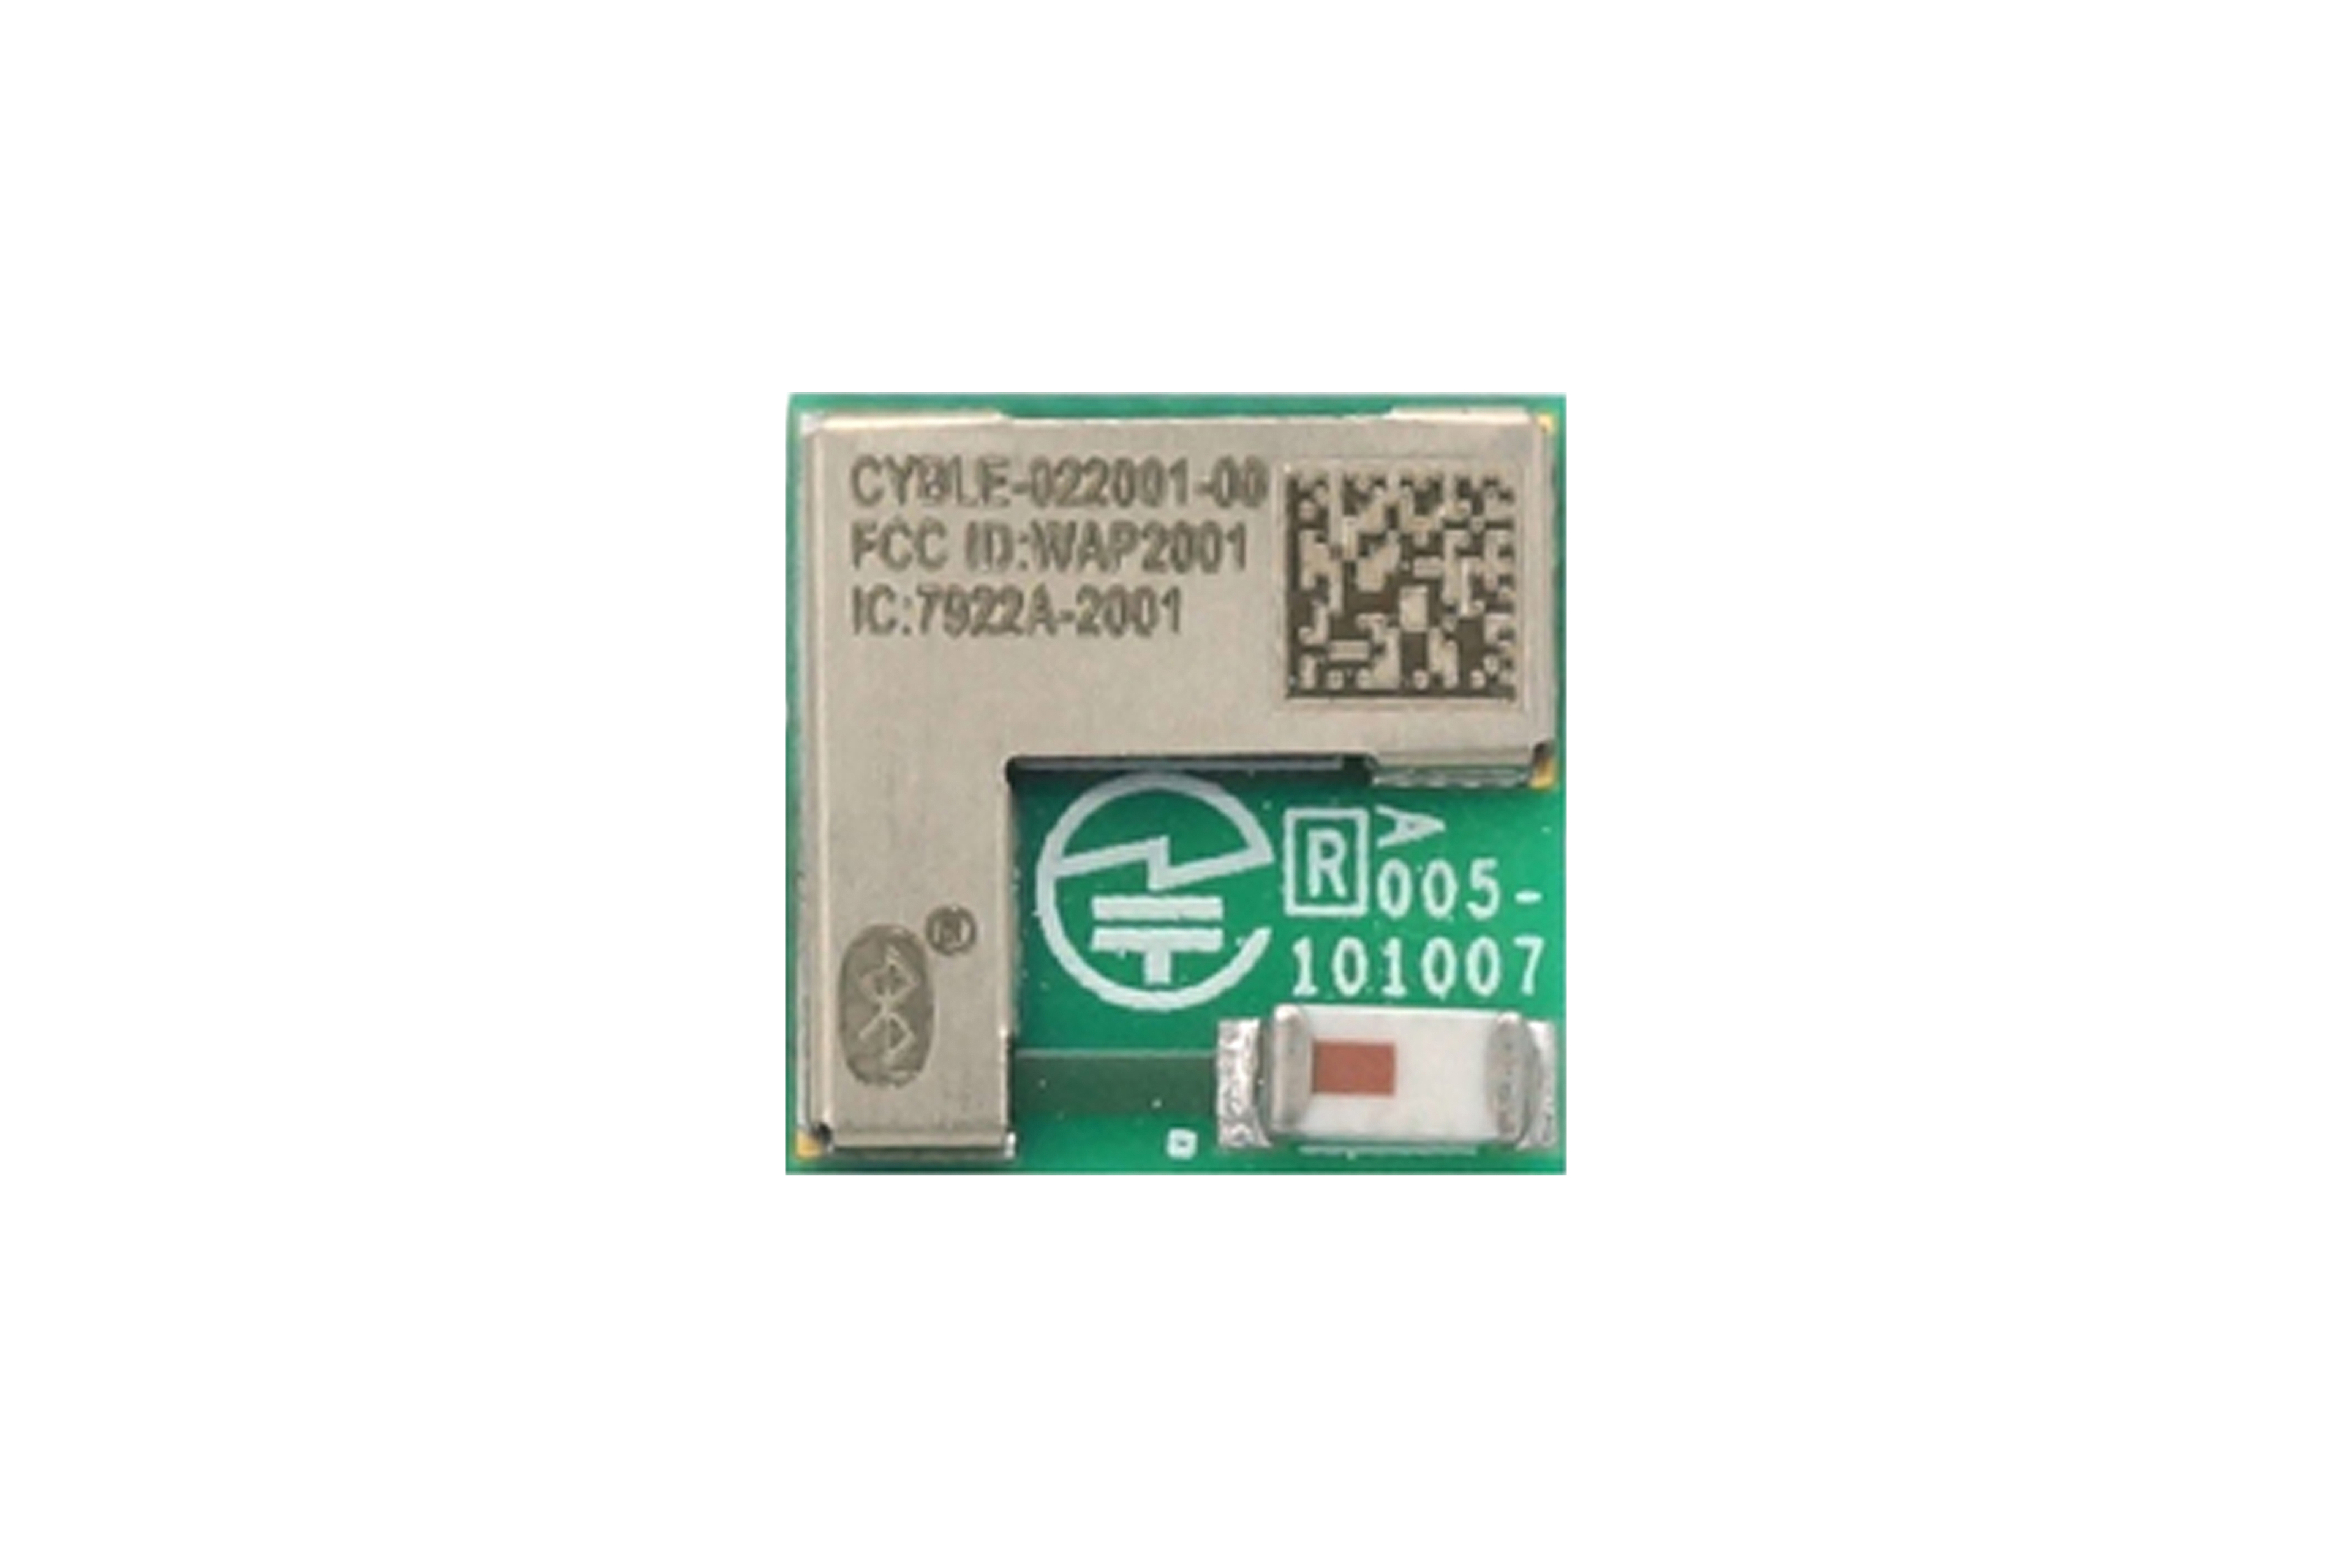 Modulo radio PRoC EZ-BLE, antenna Chip